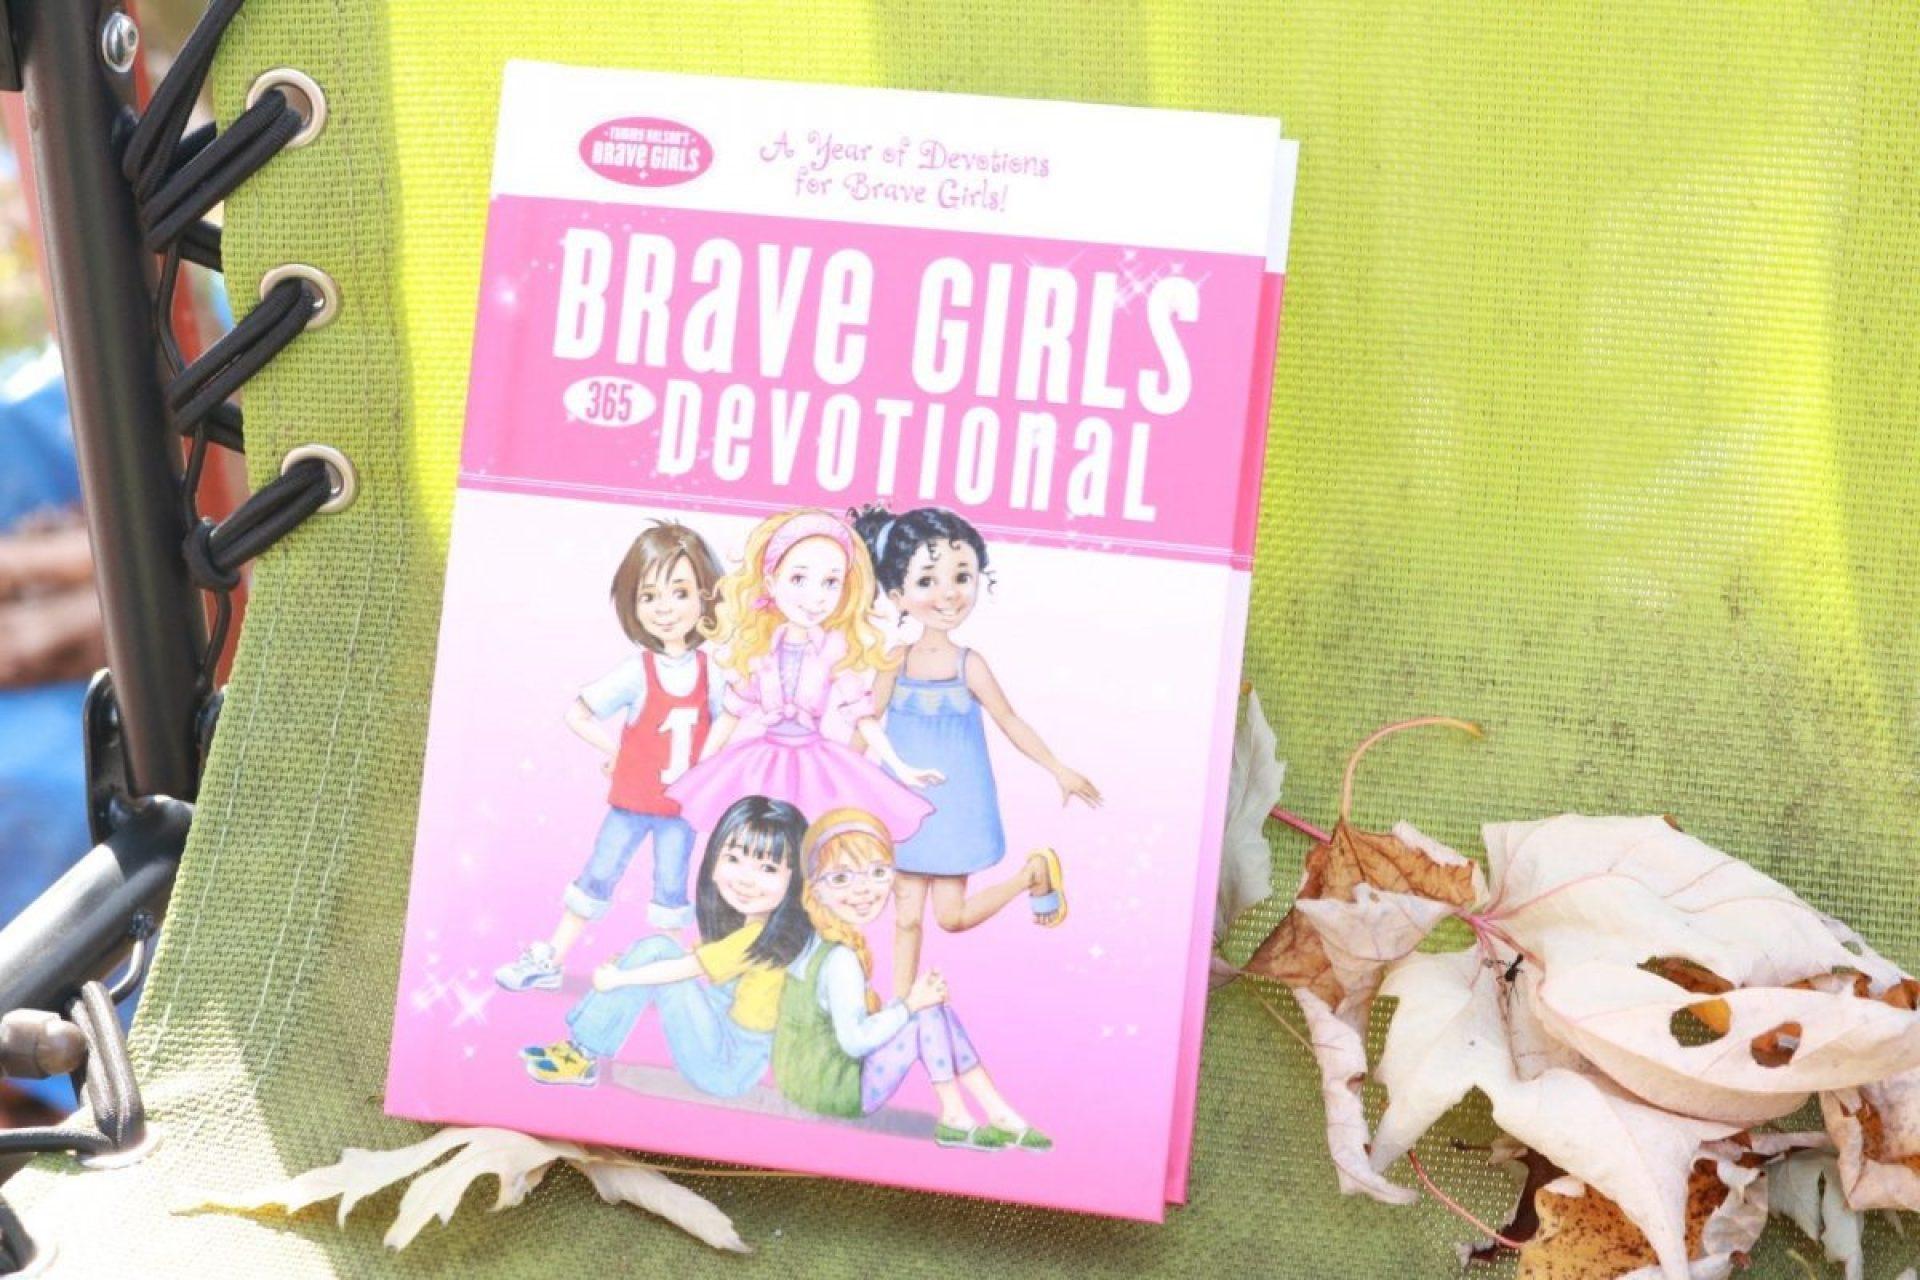 Brave Girls Devotional Review